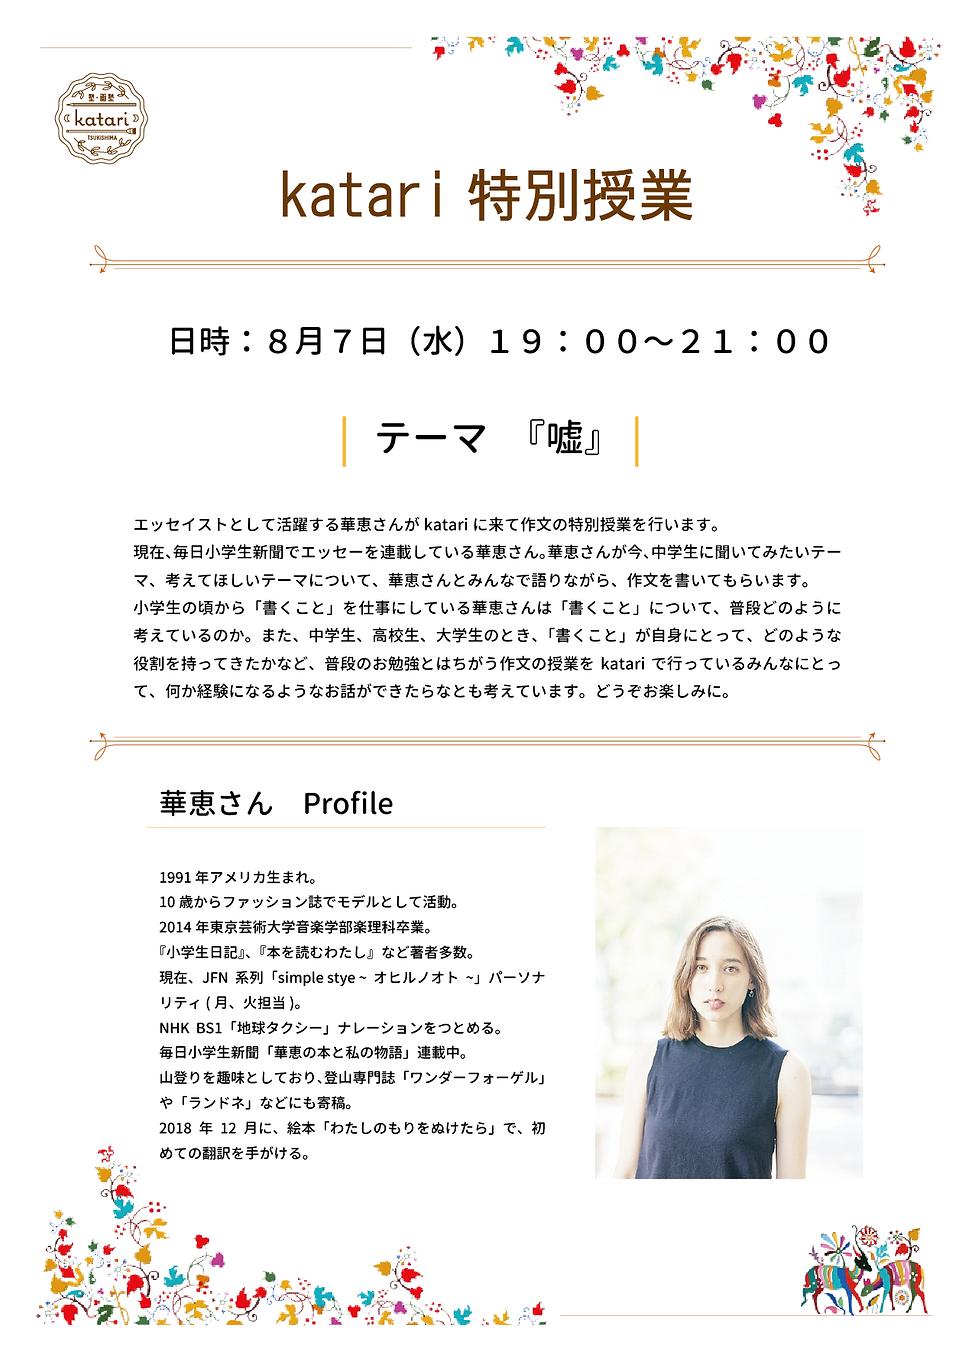 tokubetsu_01.png